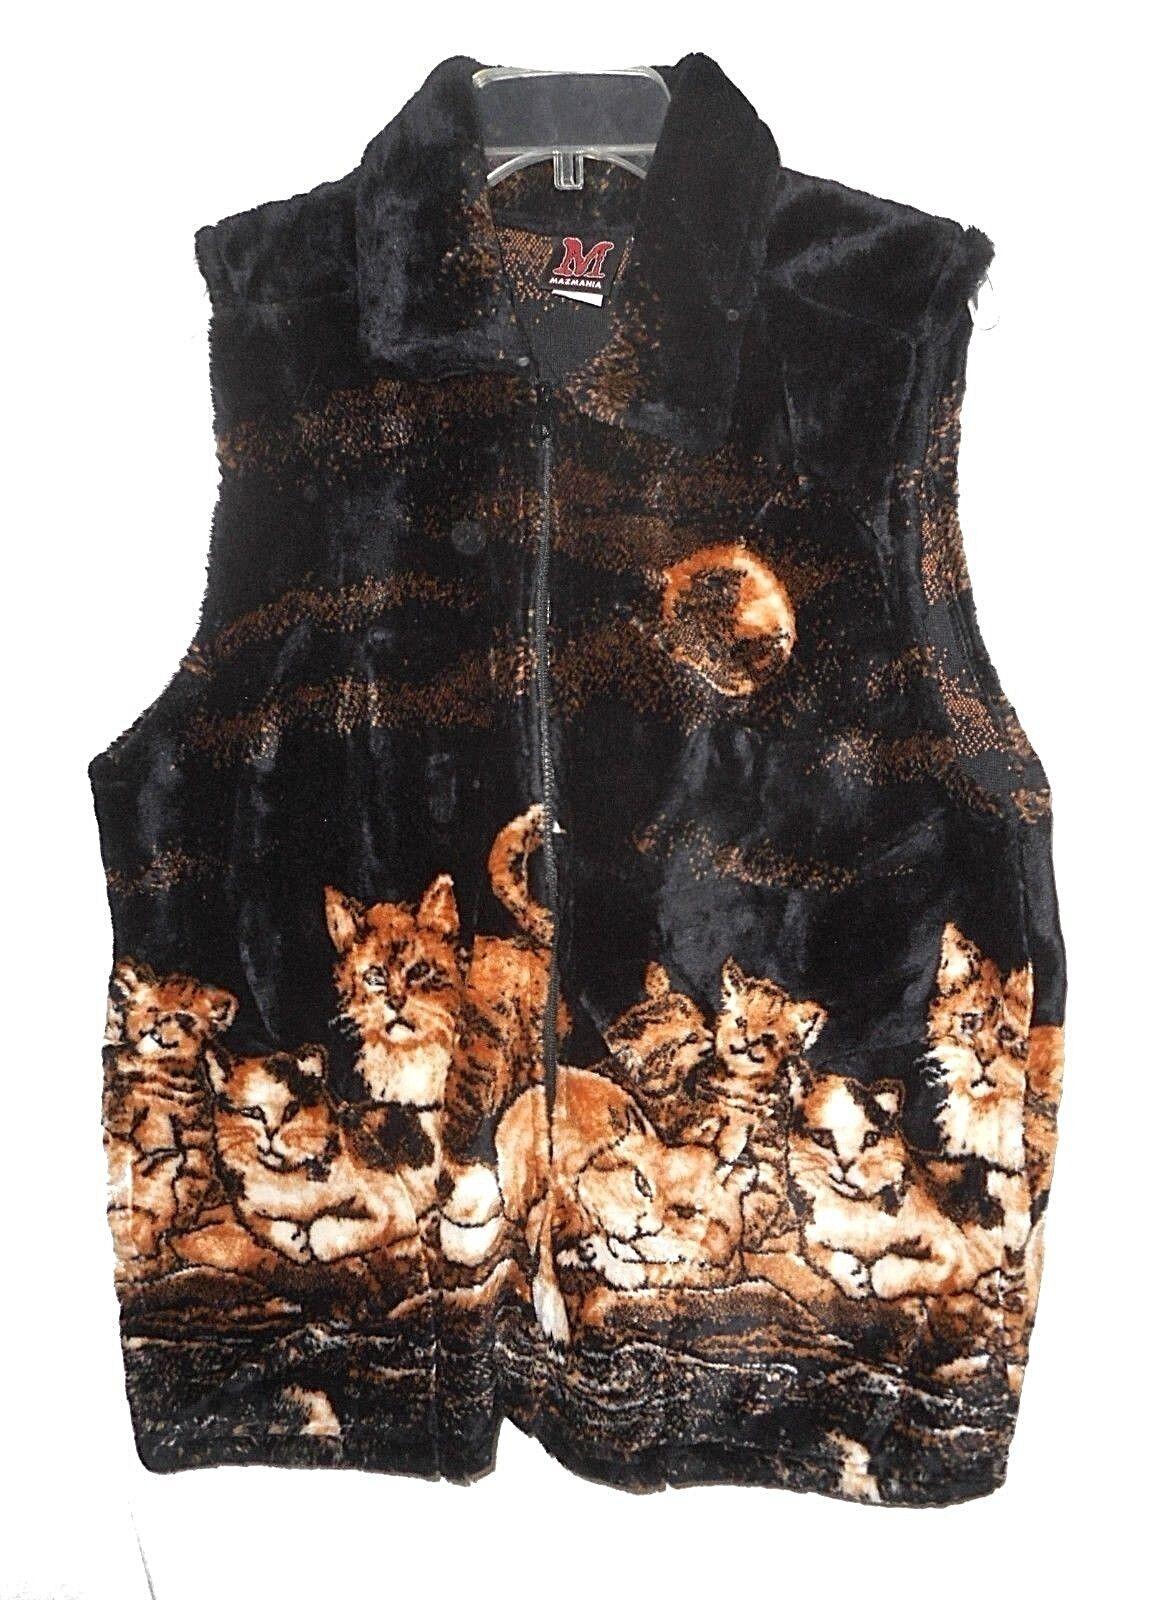 New Vest, Mazmania, Kittens Cats Calico Moon Plush Fleece Warm Zippered  L